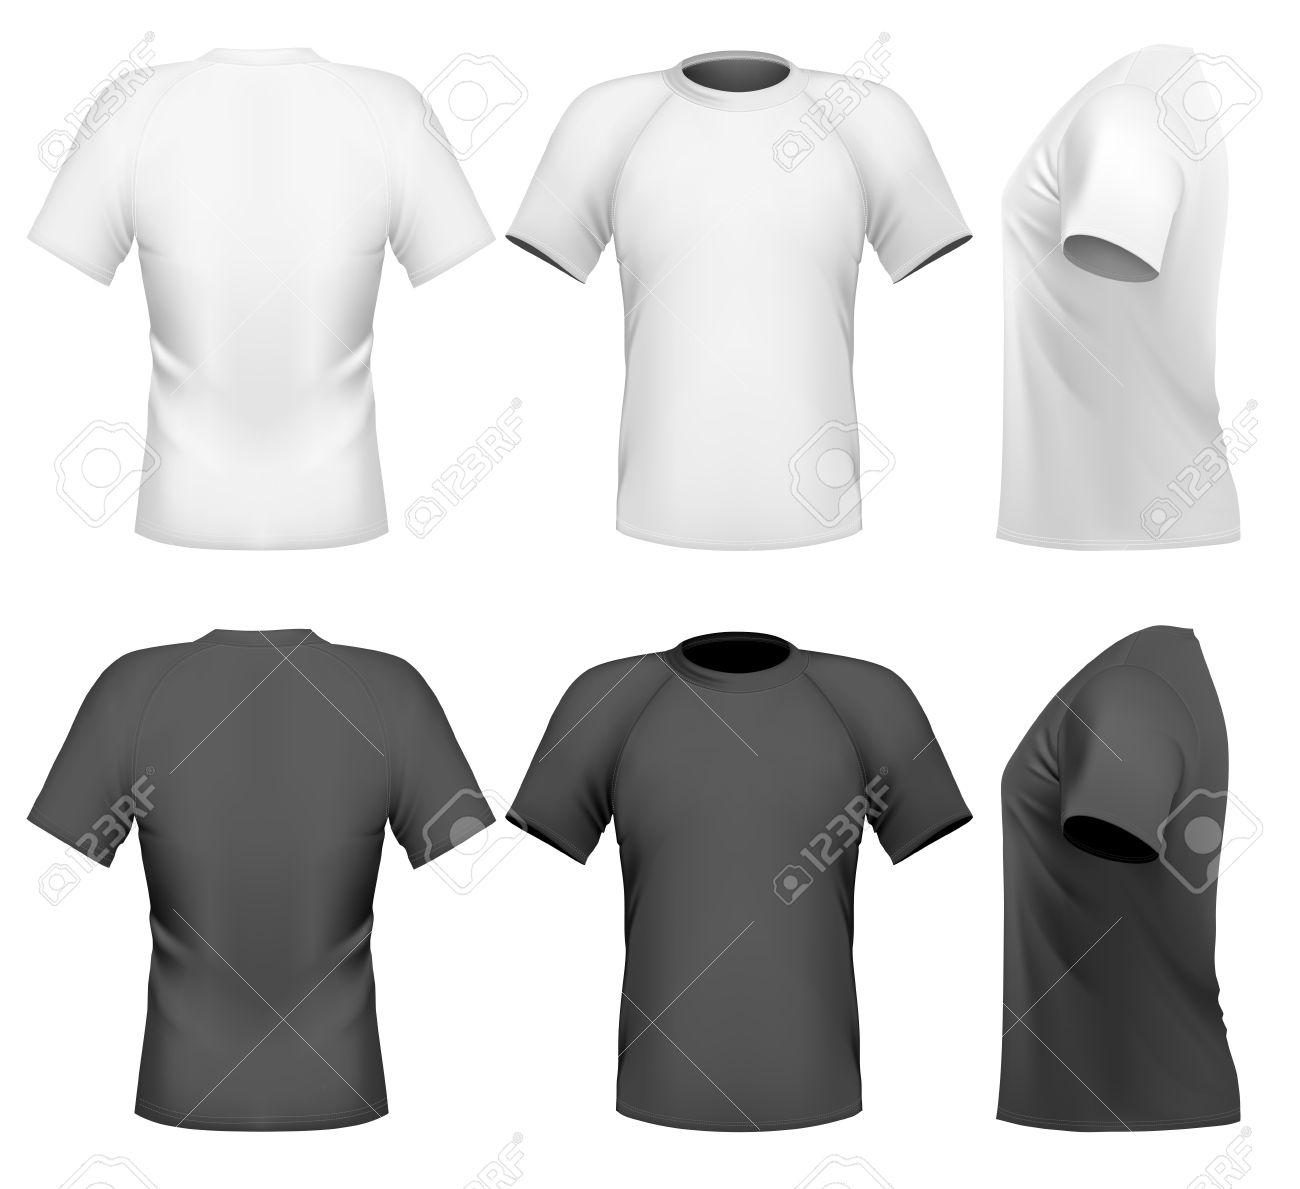 Design t shirt back - Men S T Shirt Design Template Front Back And Side View